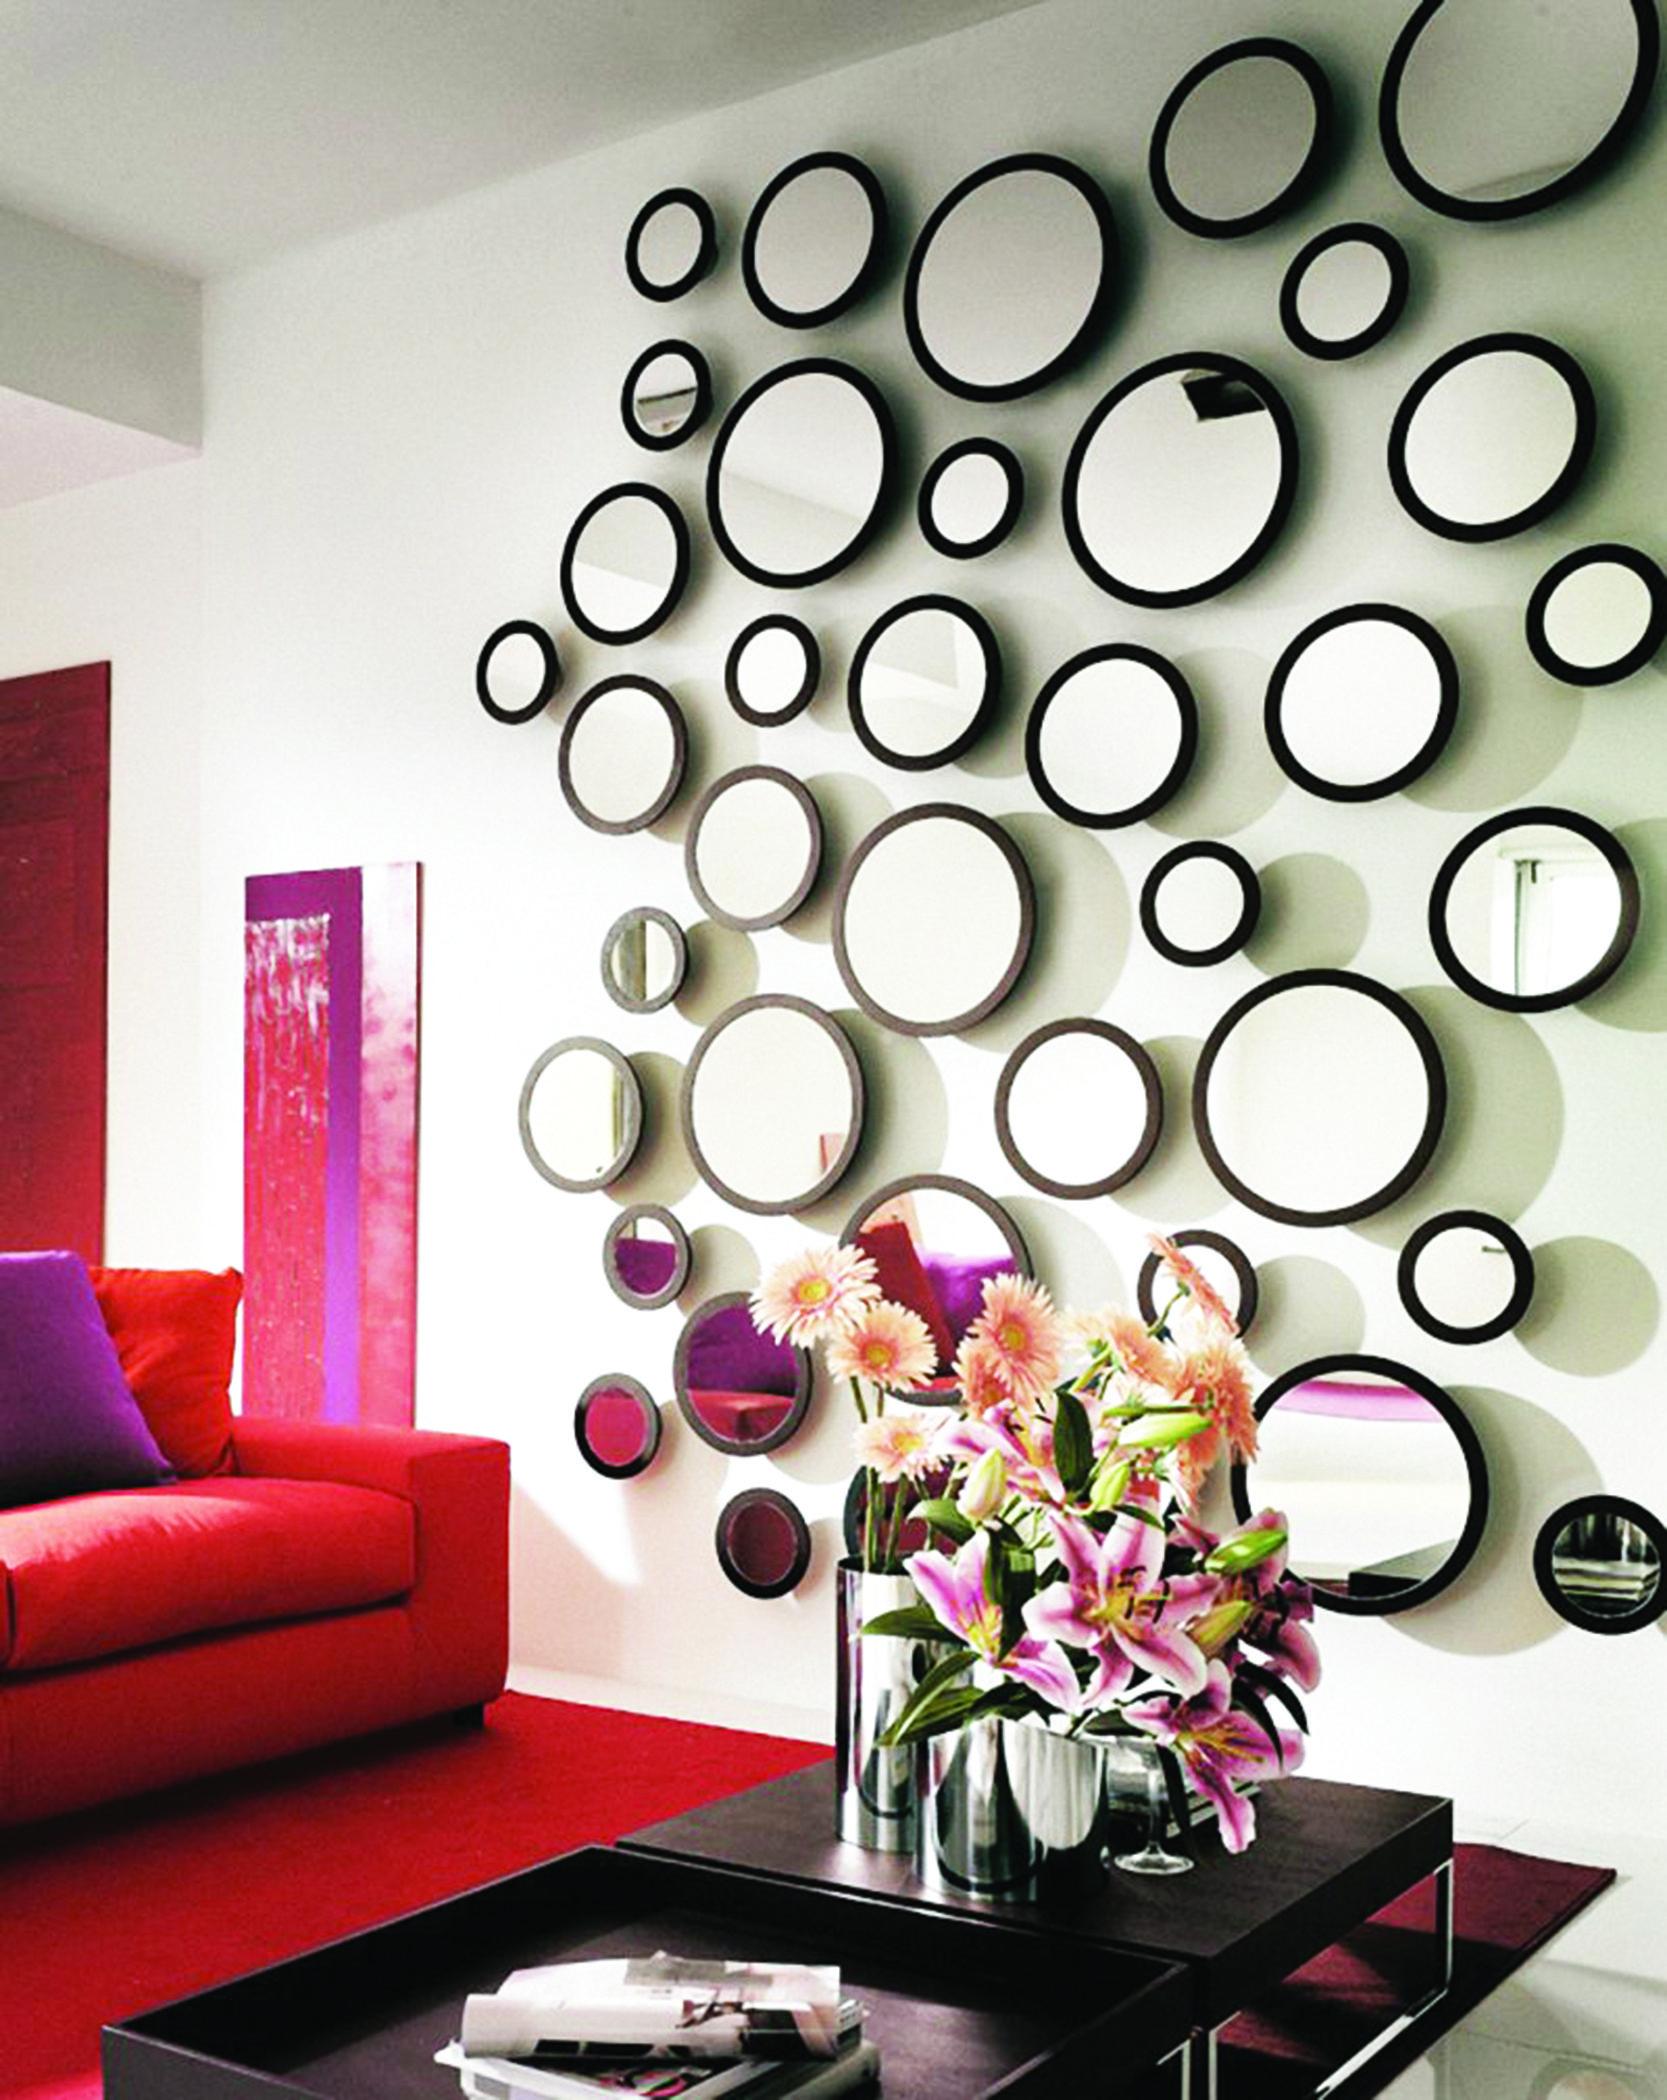 Wall decors news ghana for Bathroom accessories in ghana